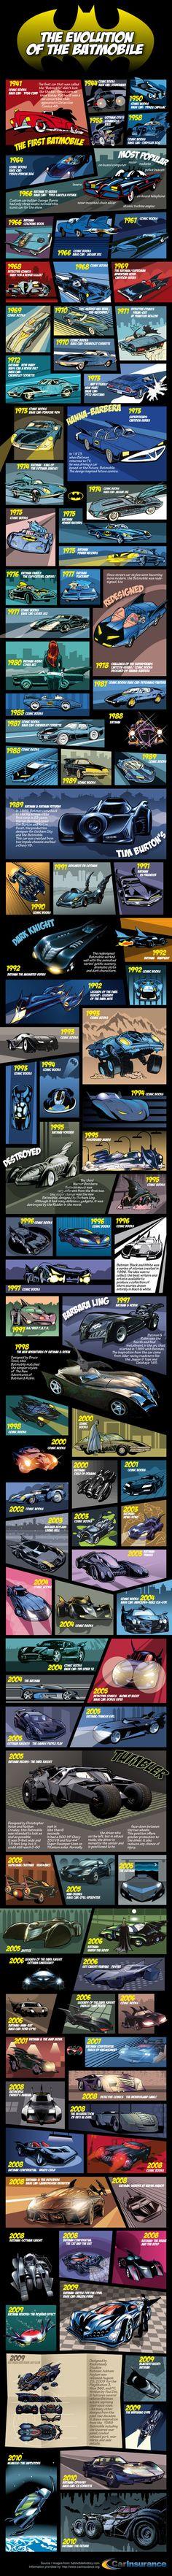 History of the Batmobile --- #Batman